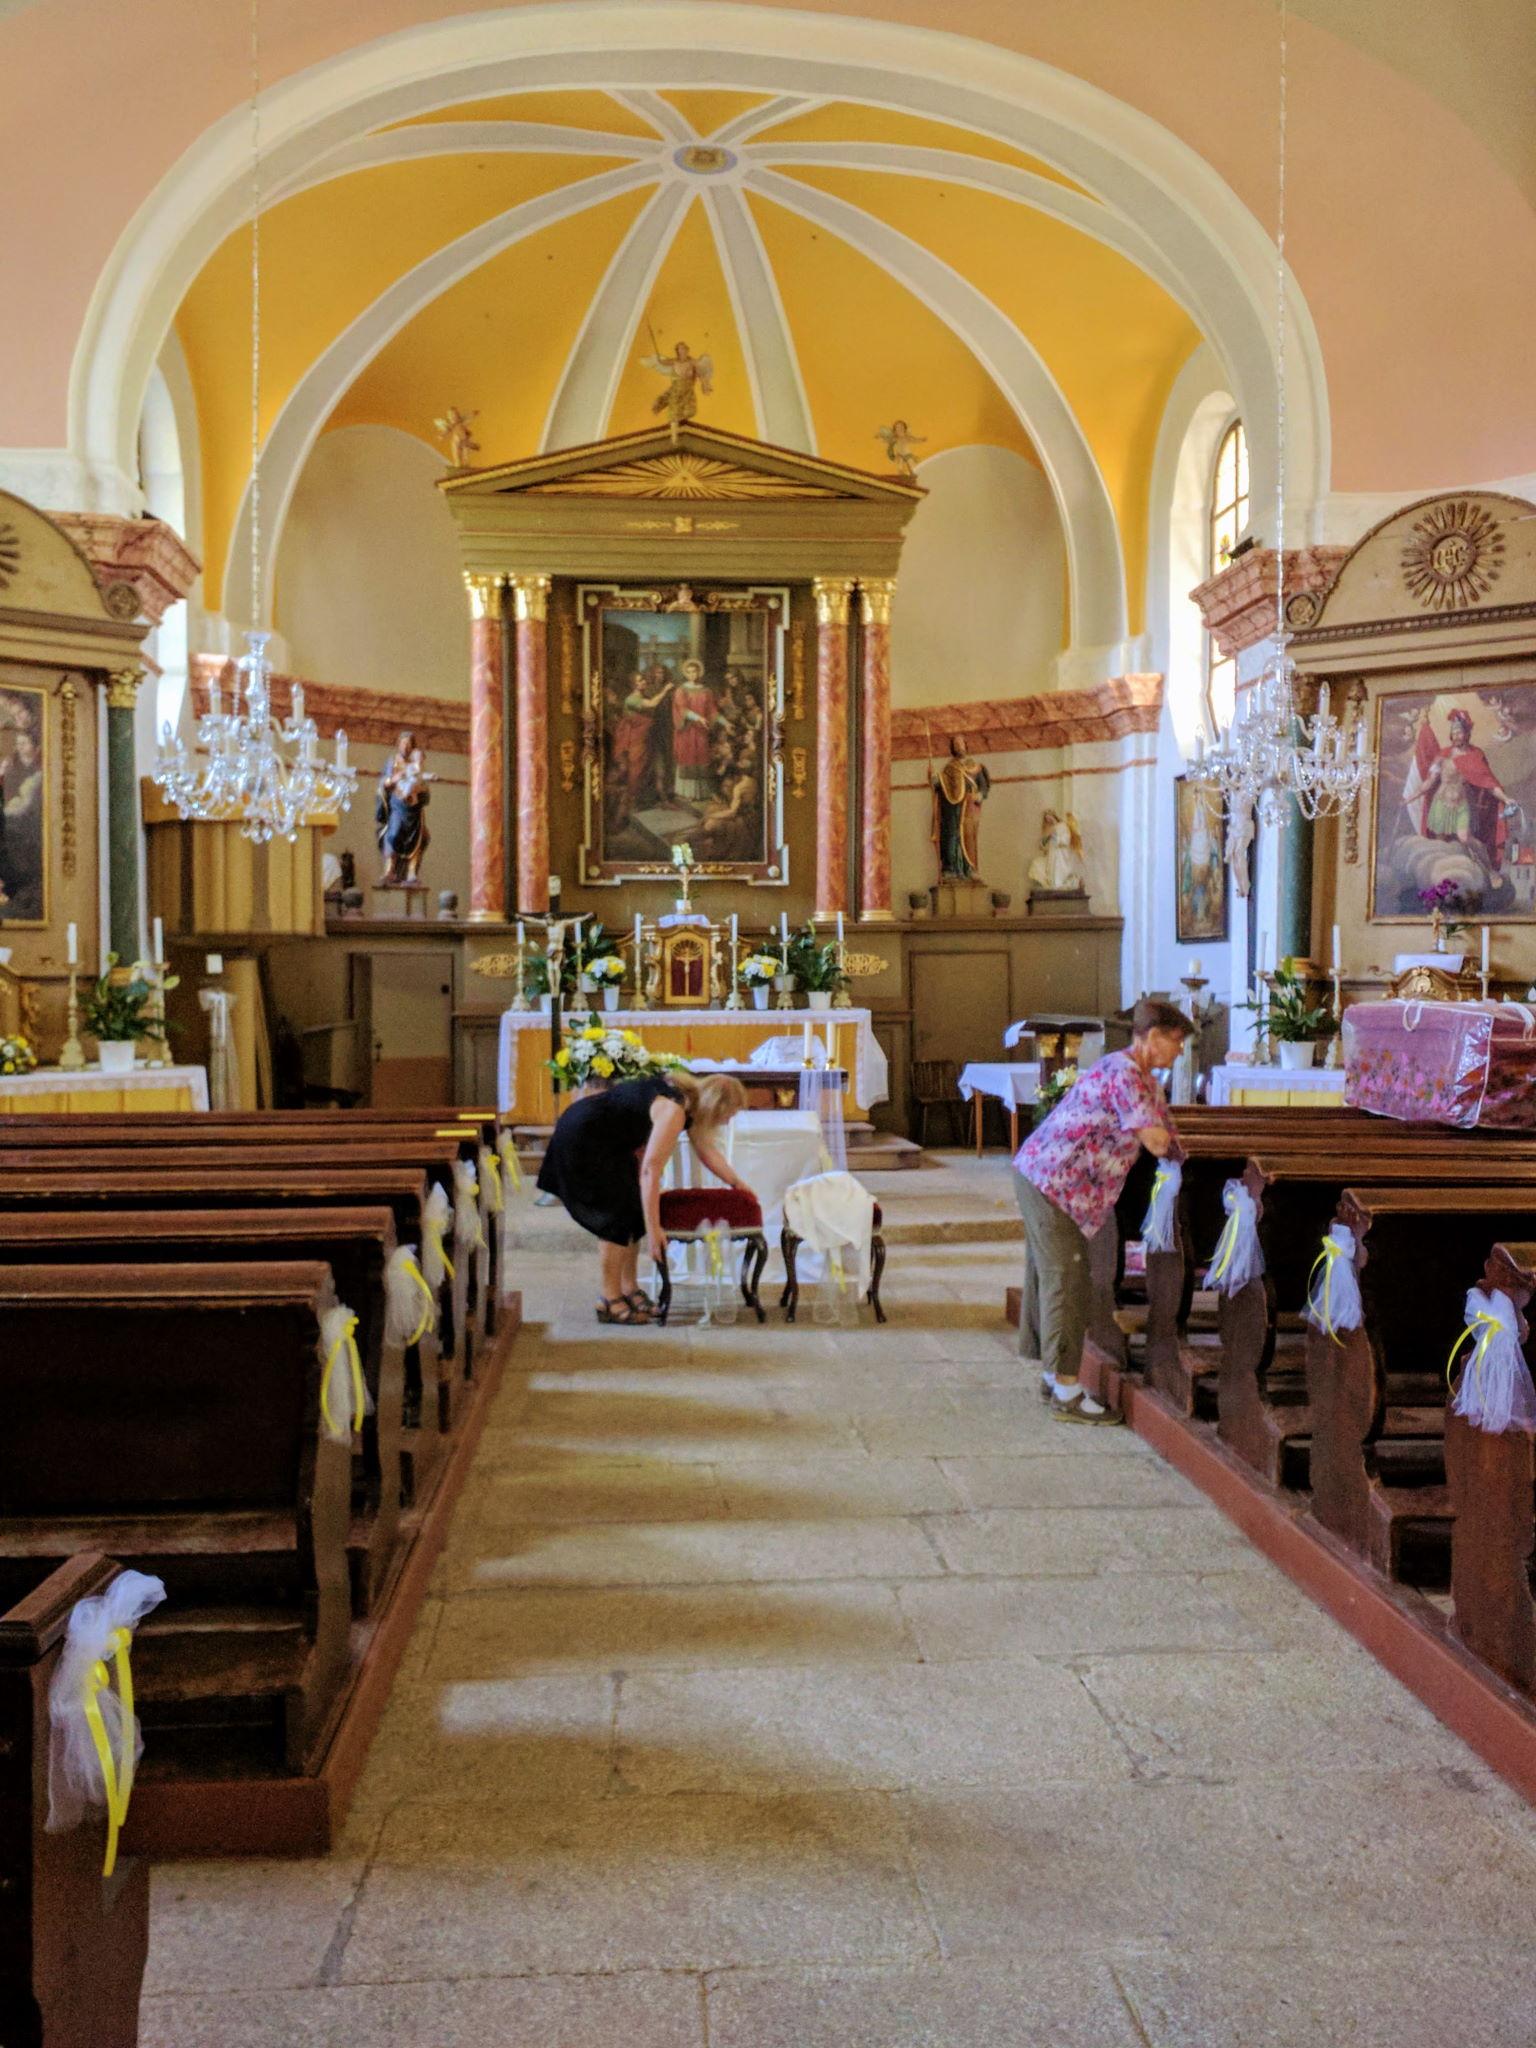 Innenraum der St.-Laurentius-Kirche